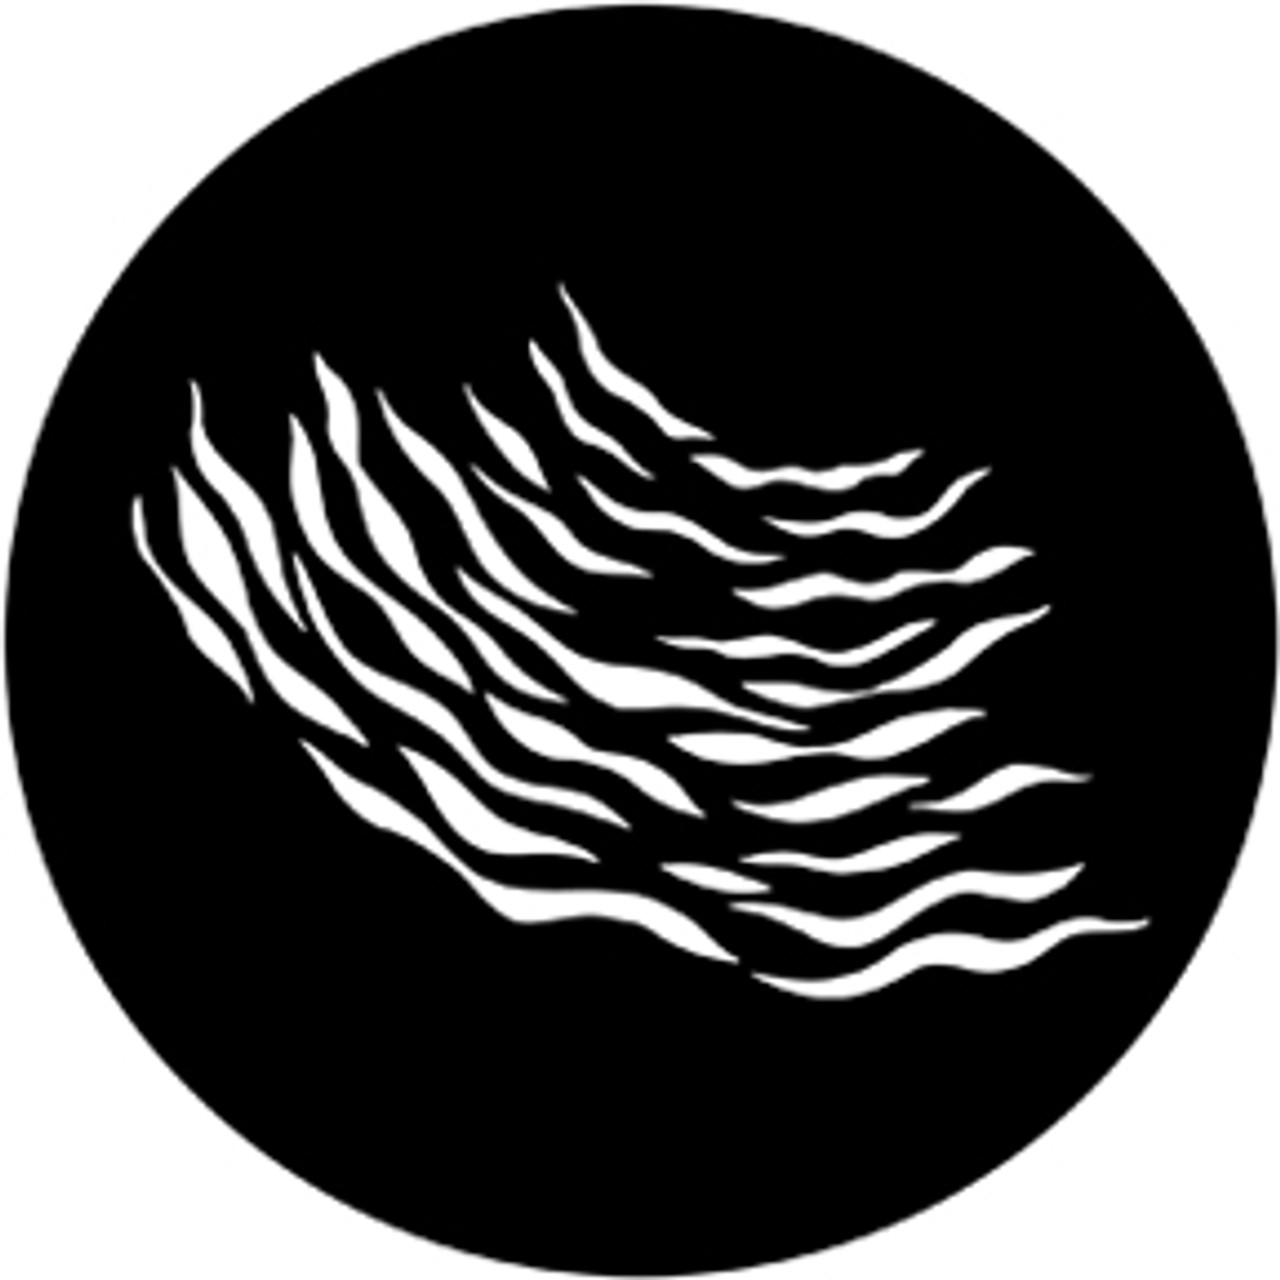 Rosco/GAM Les Mis Quadrant Whirlpool Steel Gobo